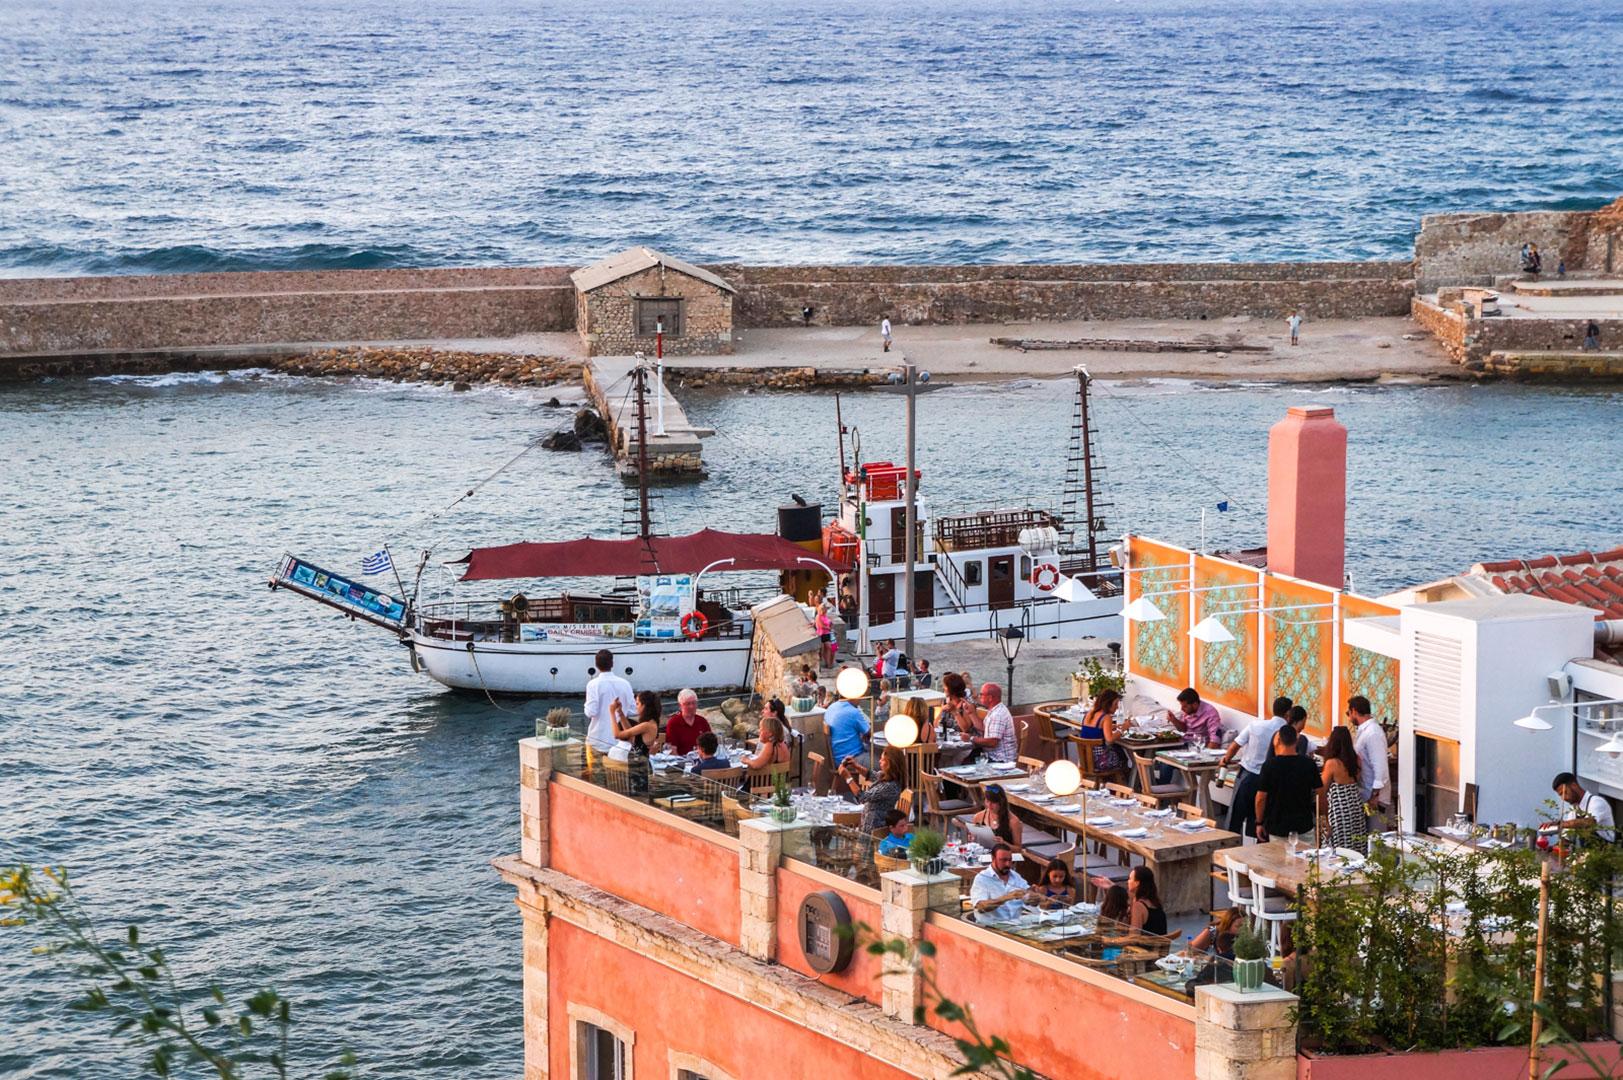 chania-crete-greece-la-vie-en-blog-all-rights-reserved-16